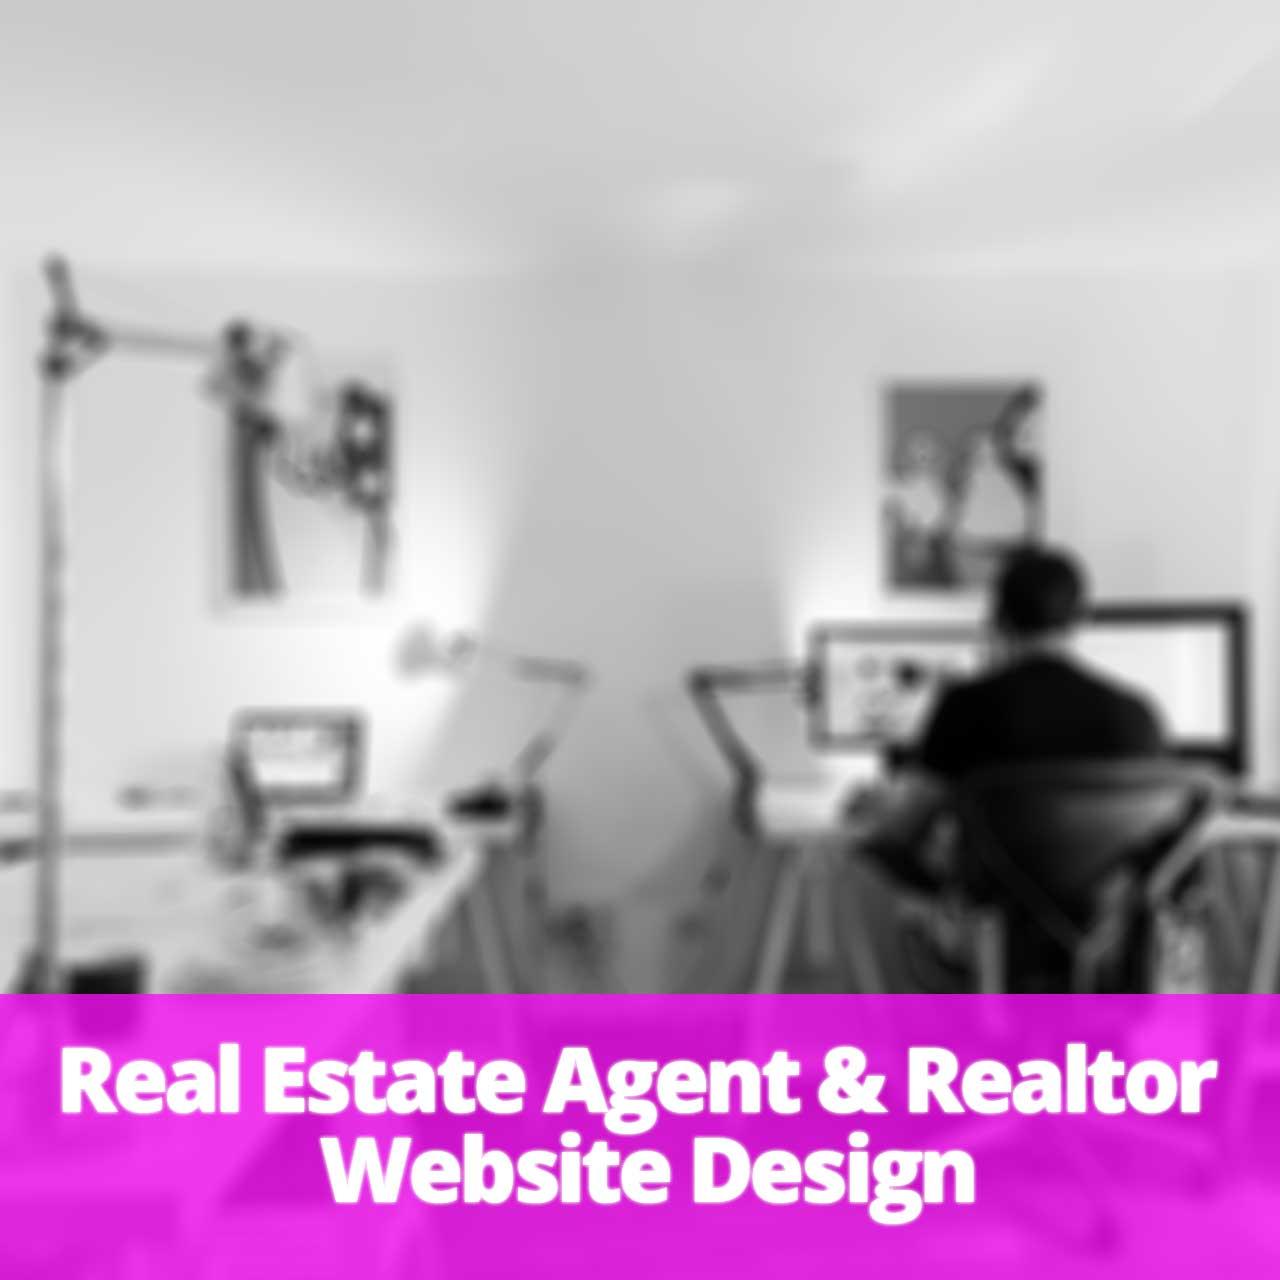 Real Estate Agent Realtor Website Design Custom Web Design Ig018 Iglobalweb Best Web Design Branding Printing Company In Florida